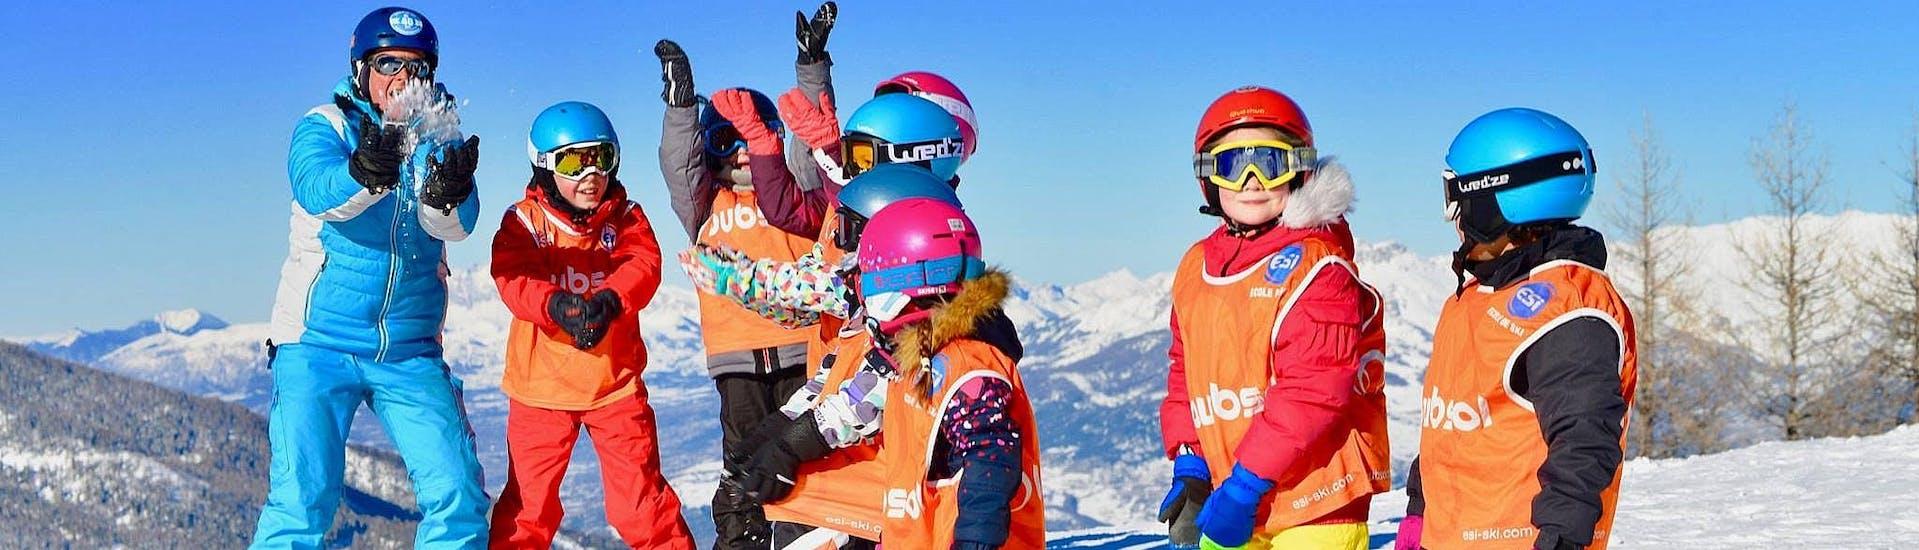 kids-ski-lessons-super-5-6-13-years-beginner-esi-les-orres-hero